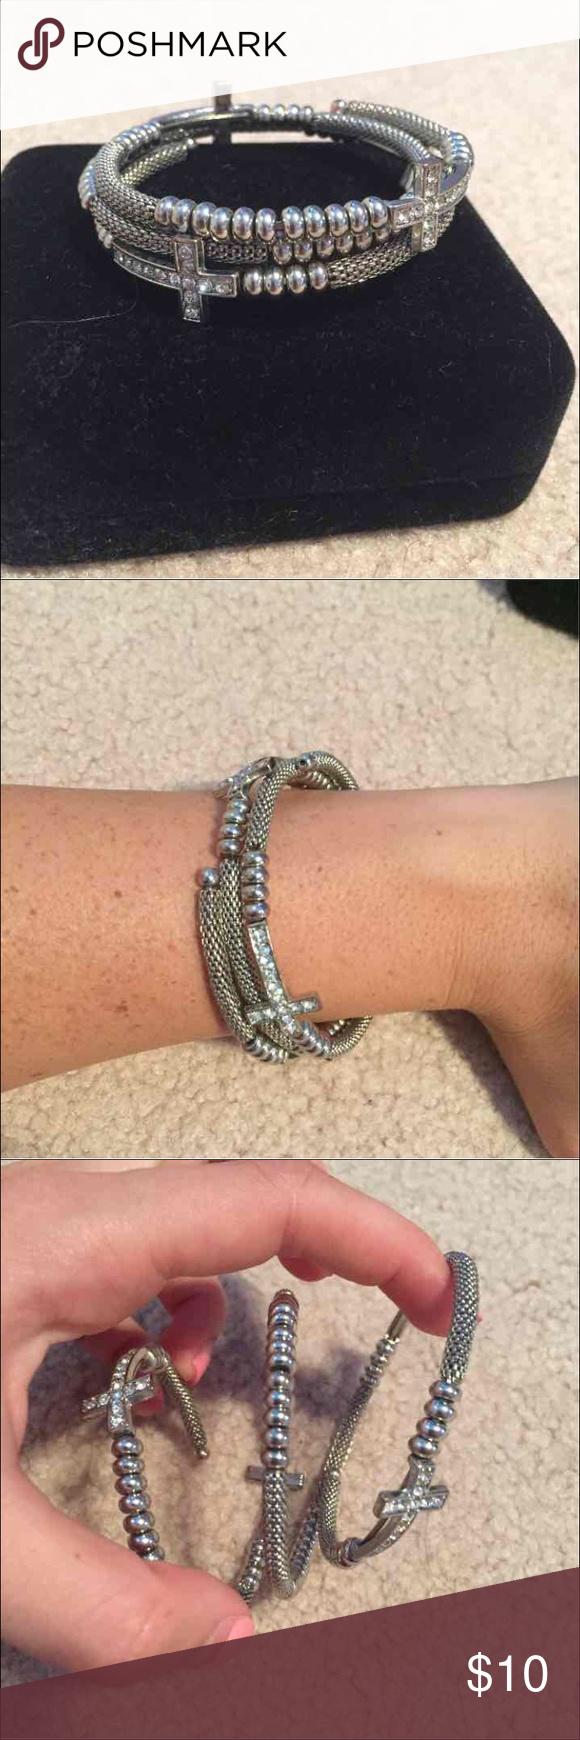 Cross bangle bracelet bangle flaws and jewelry bracelets